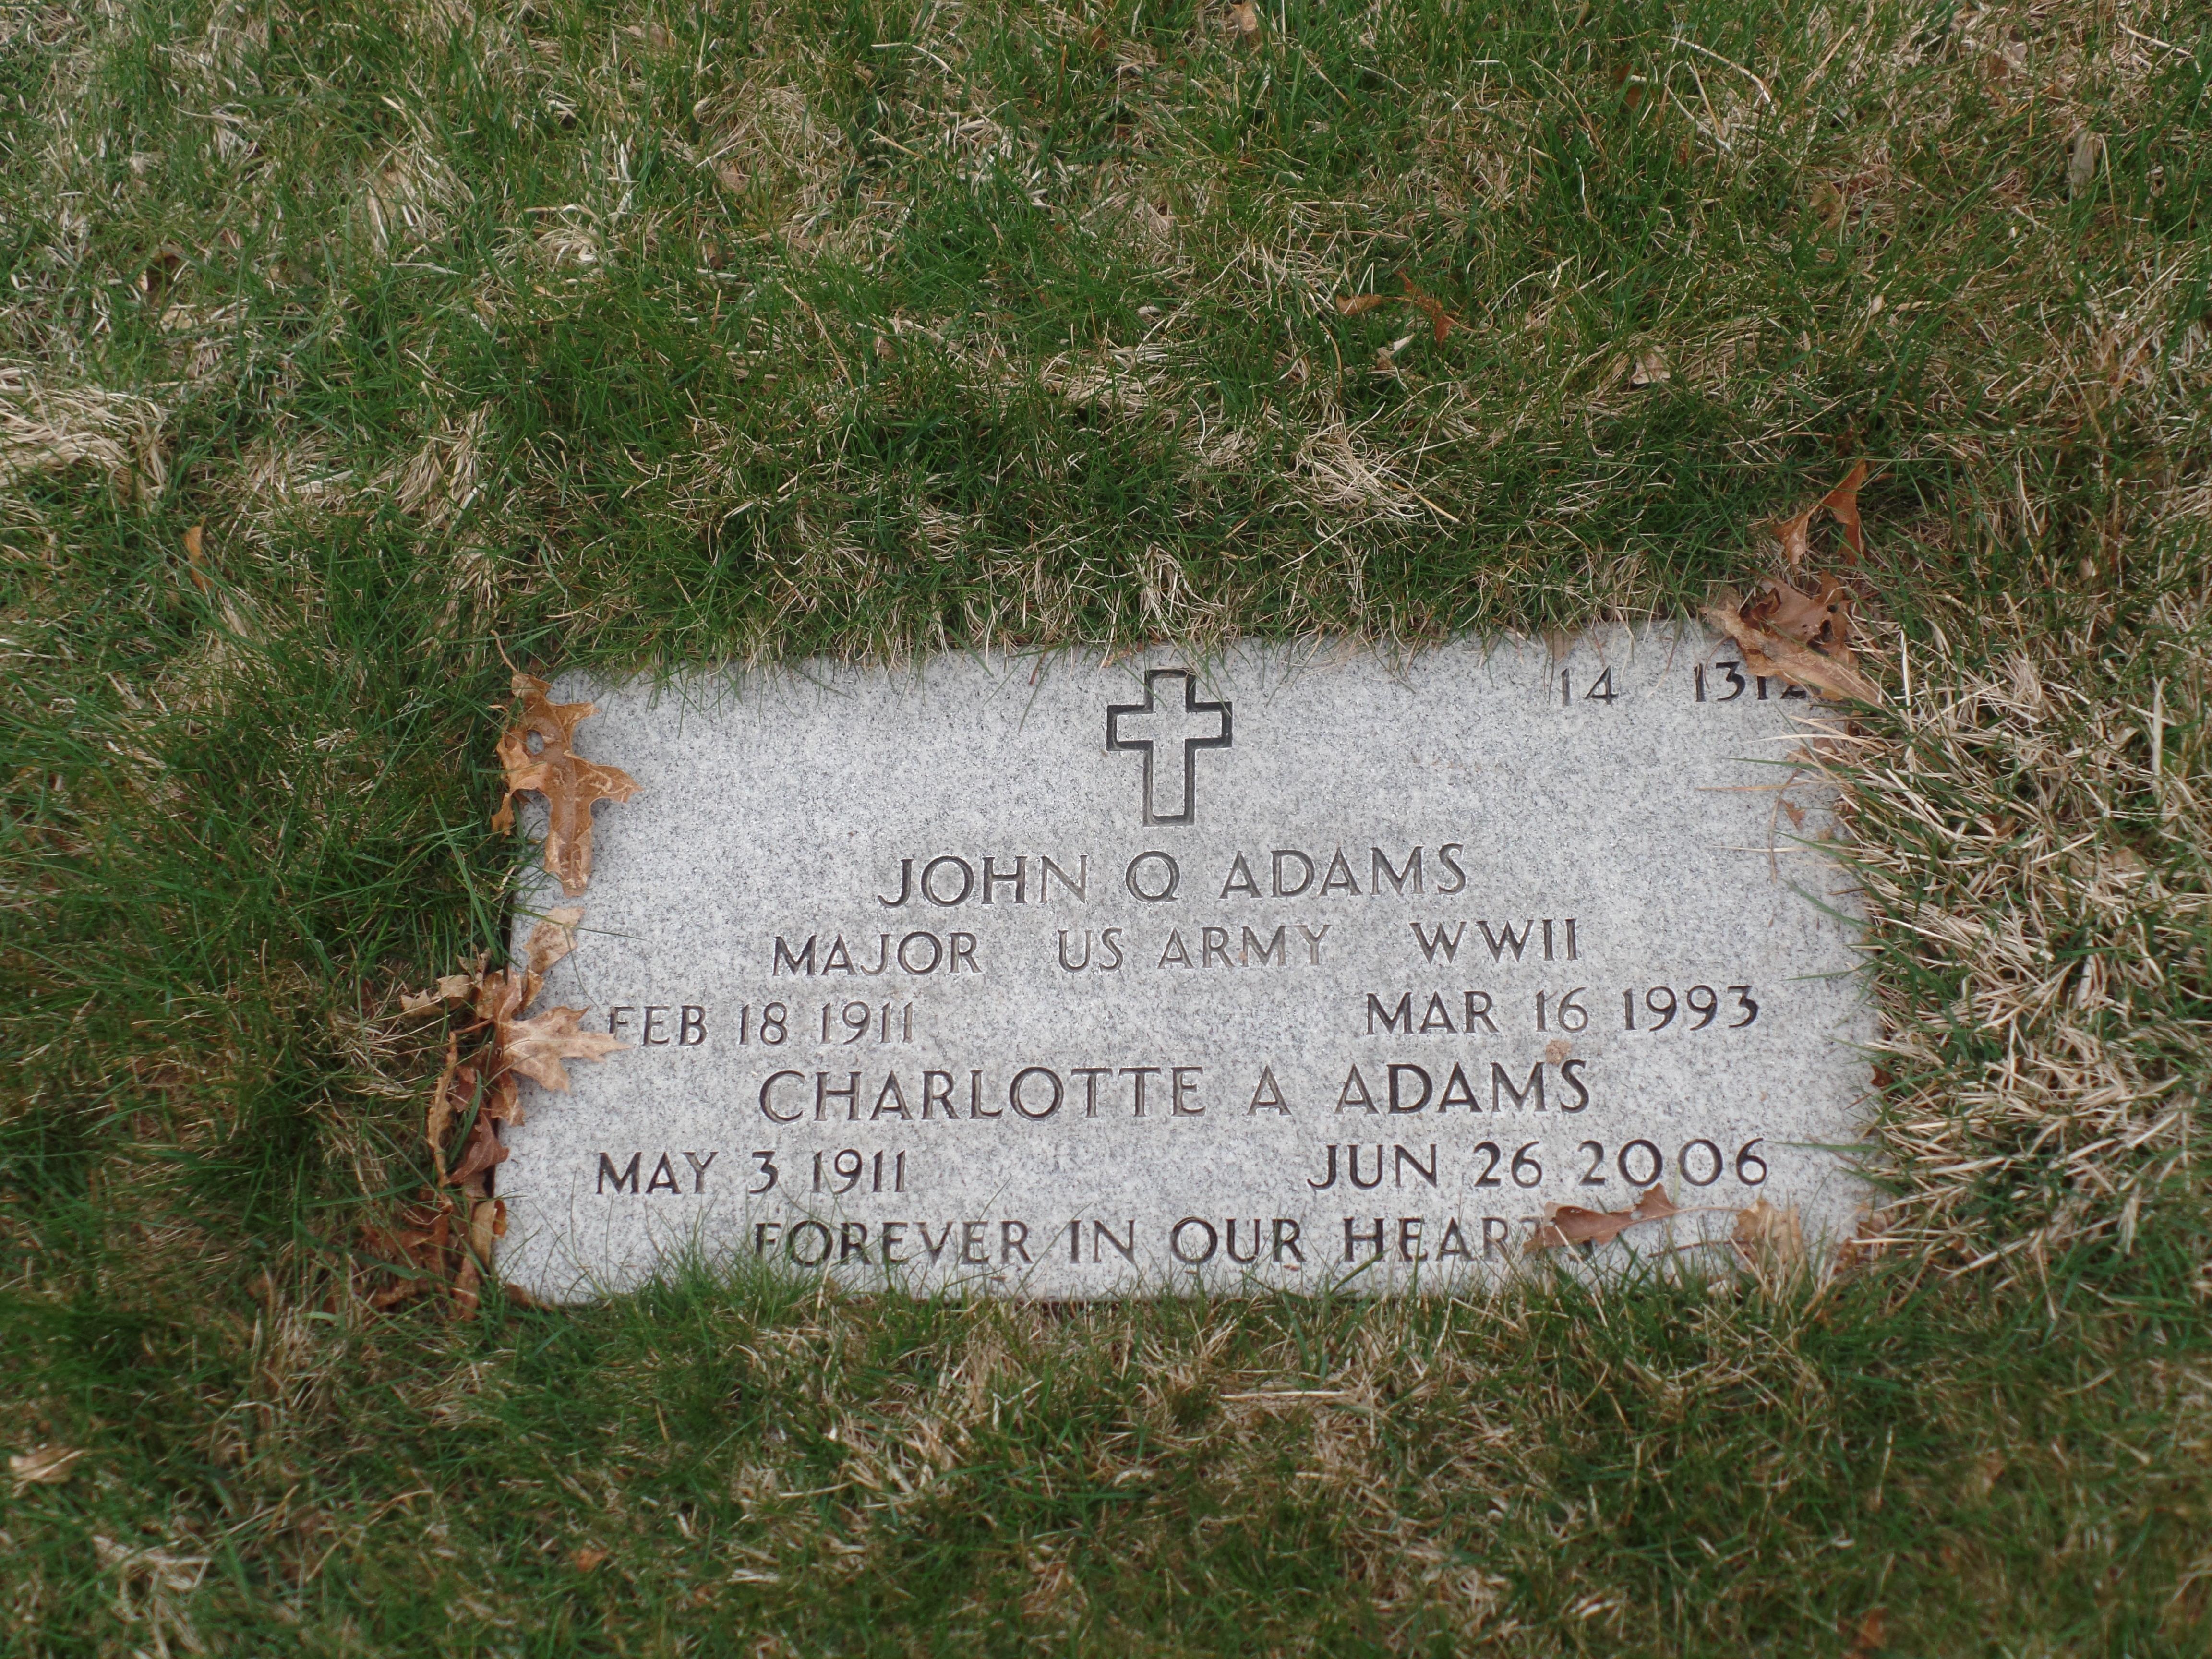 Charlotte A. Adams